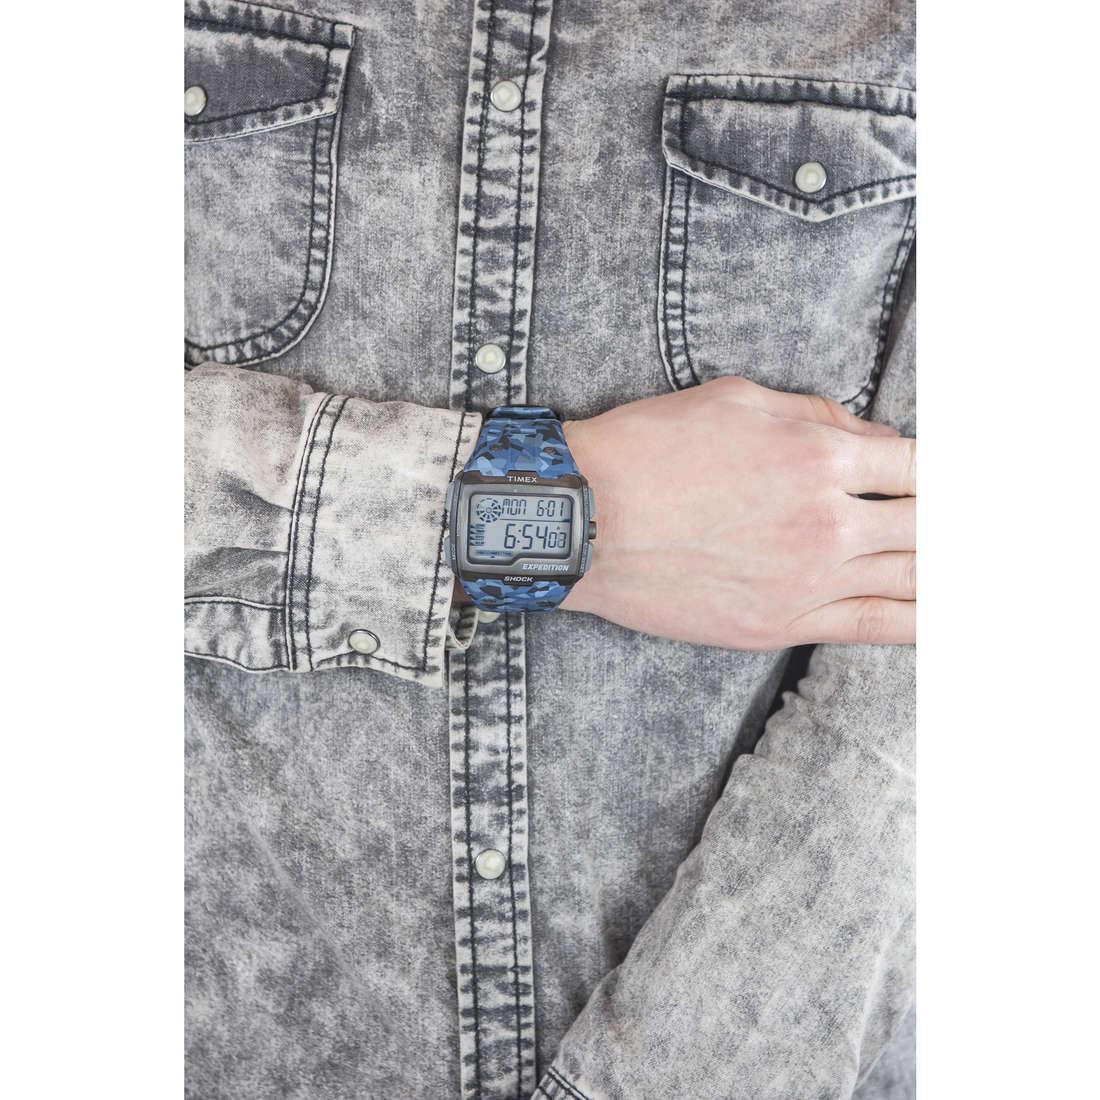 Timex digitali Grid Shock uomo TW4B07100 indosso